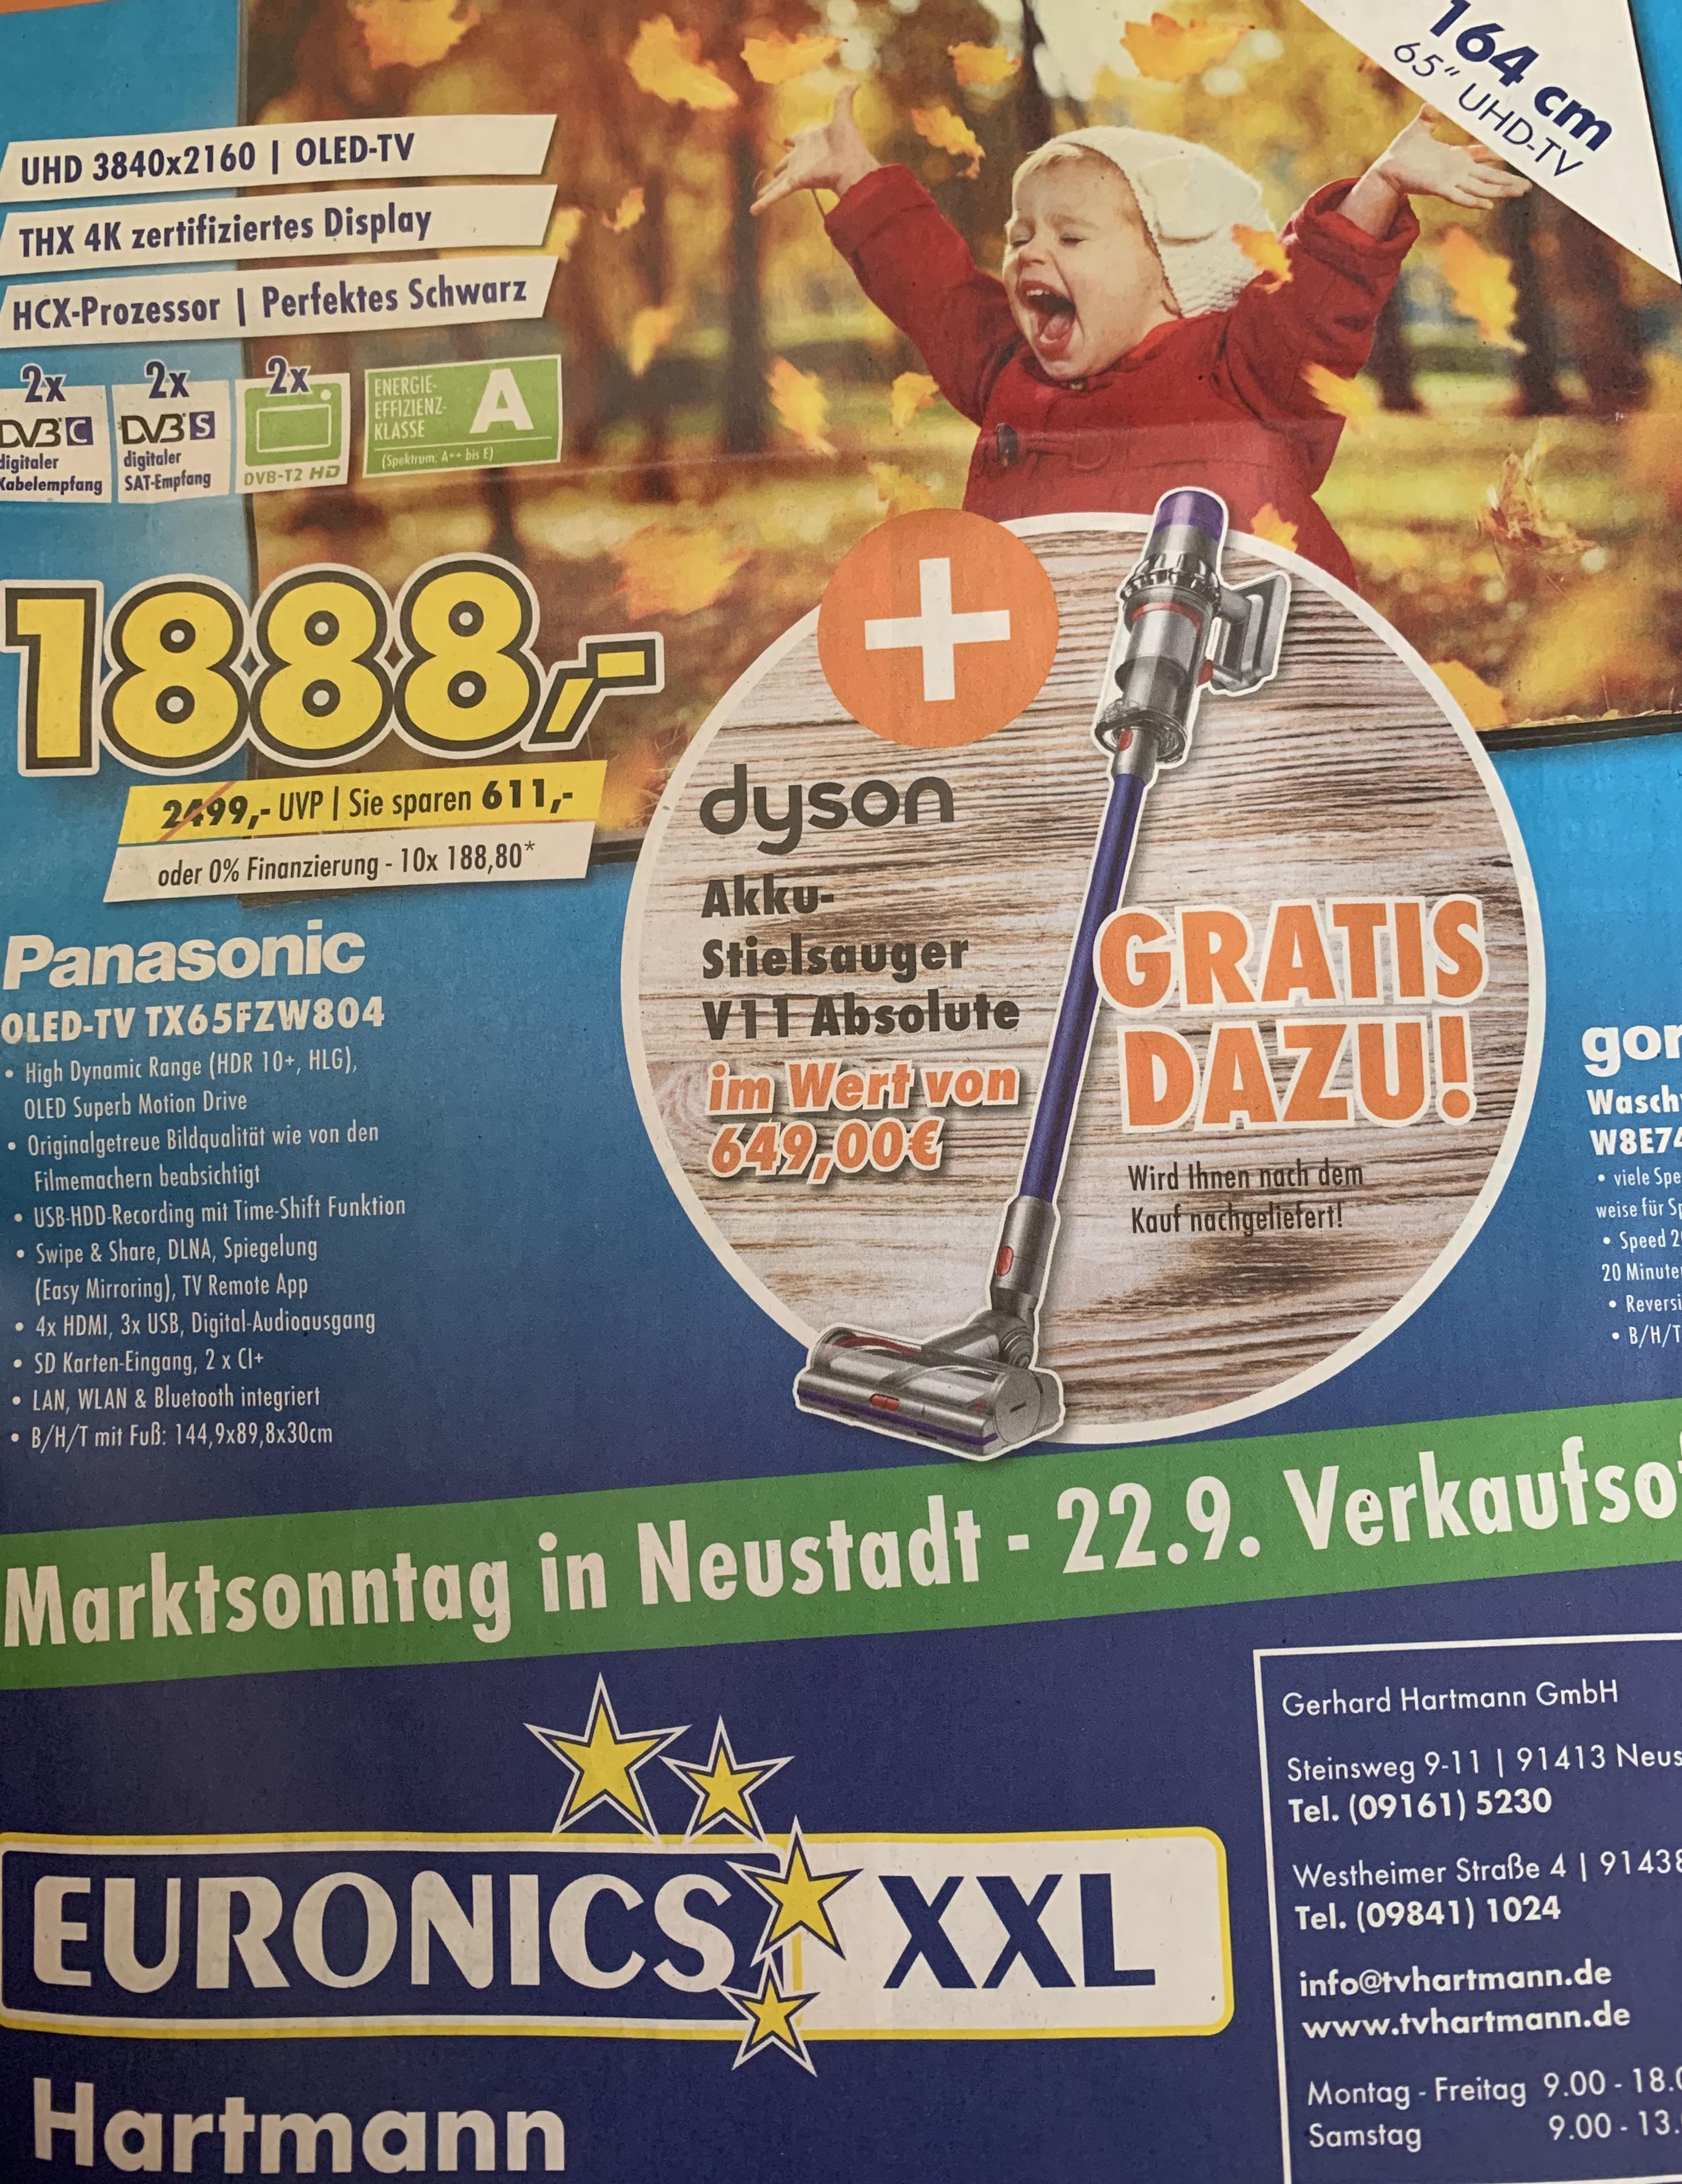 [EURONICS XXL Lokal] Panasonic TX 65FZW804 + Dyson V11 Absolute